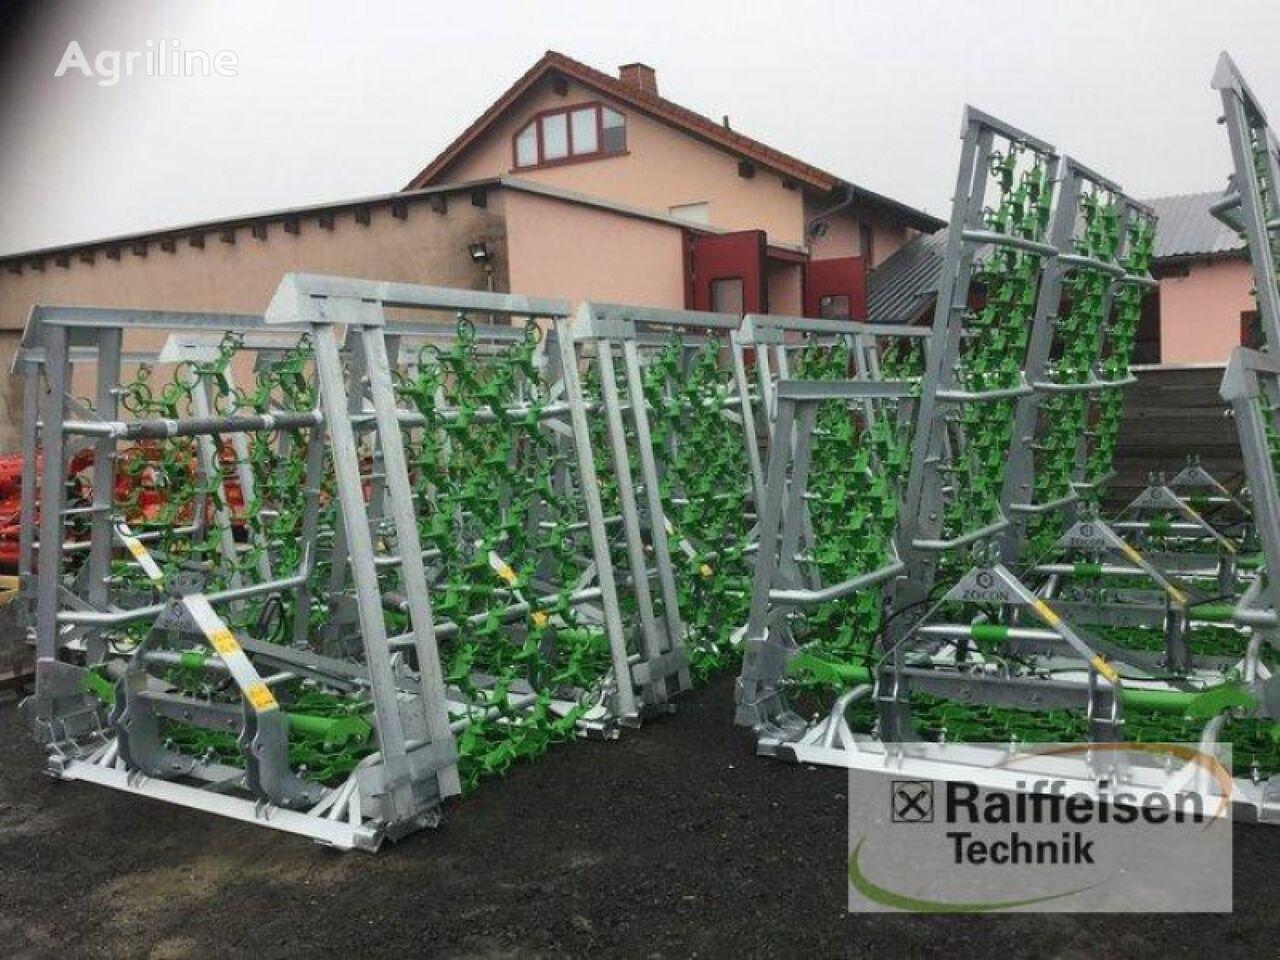 new Zocon Wiesenschleppe 5m meadow aerator